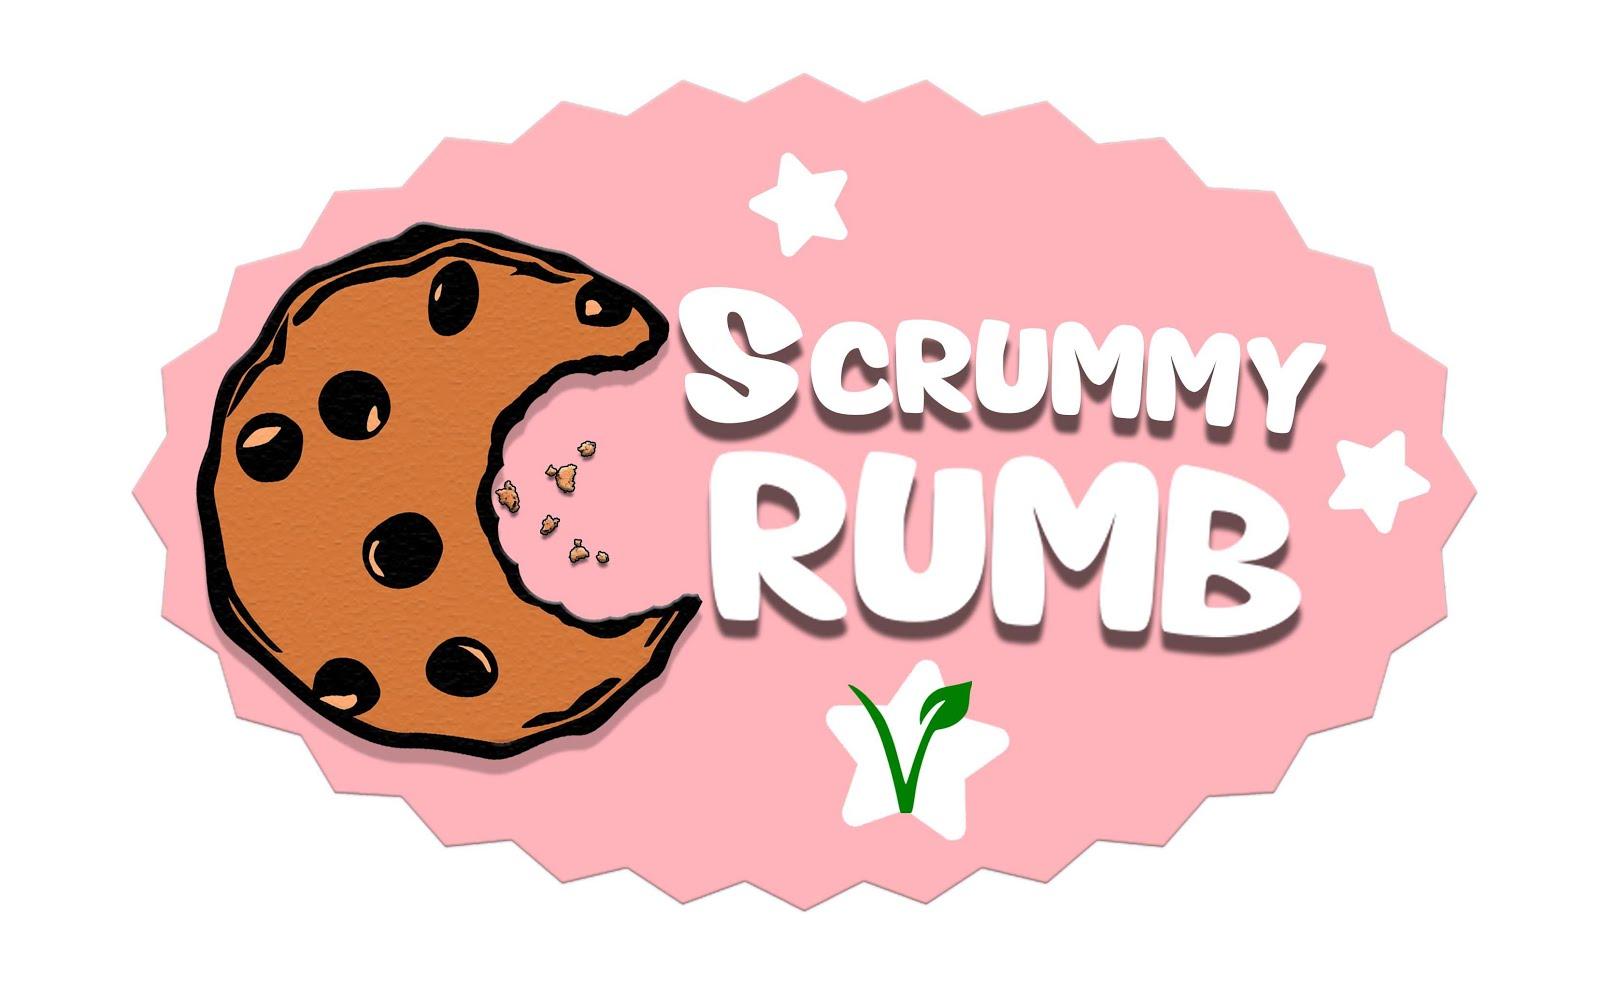 Scrummy Crumb